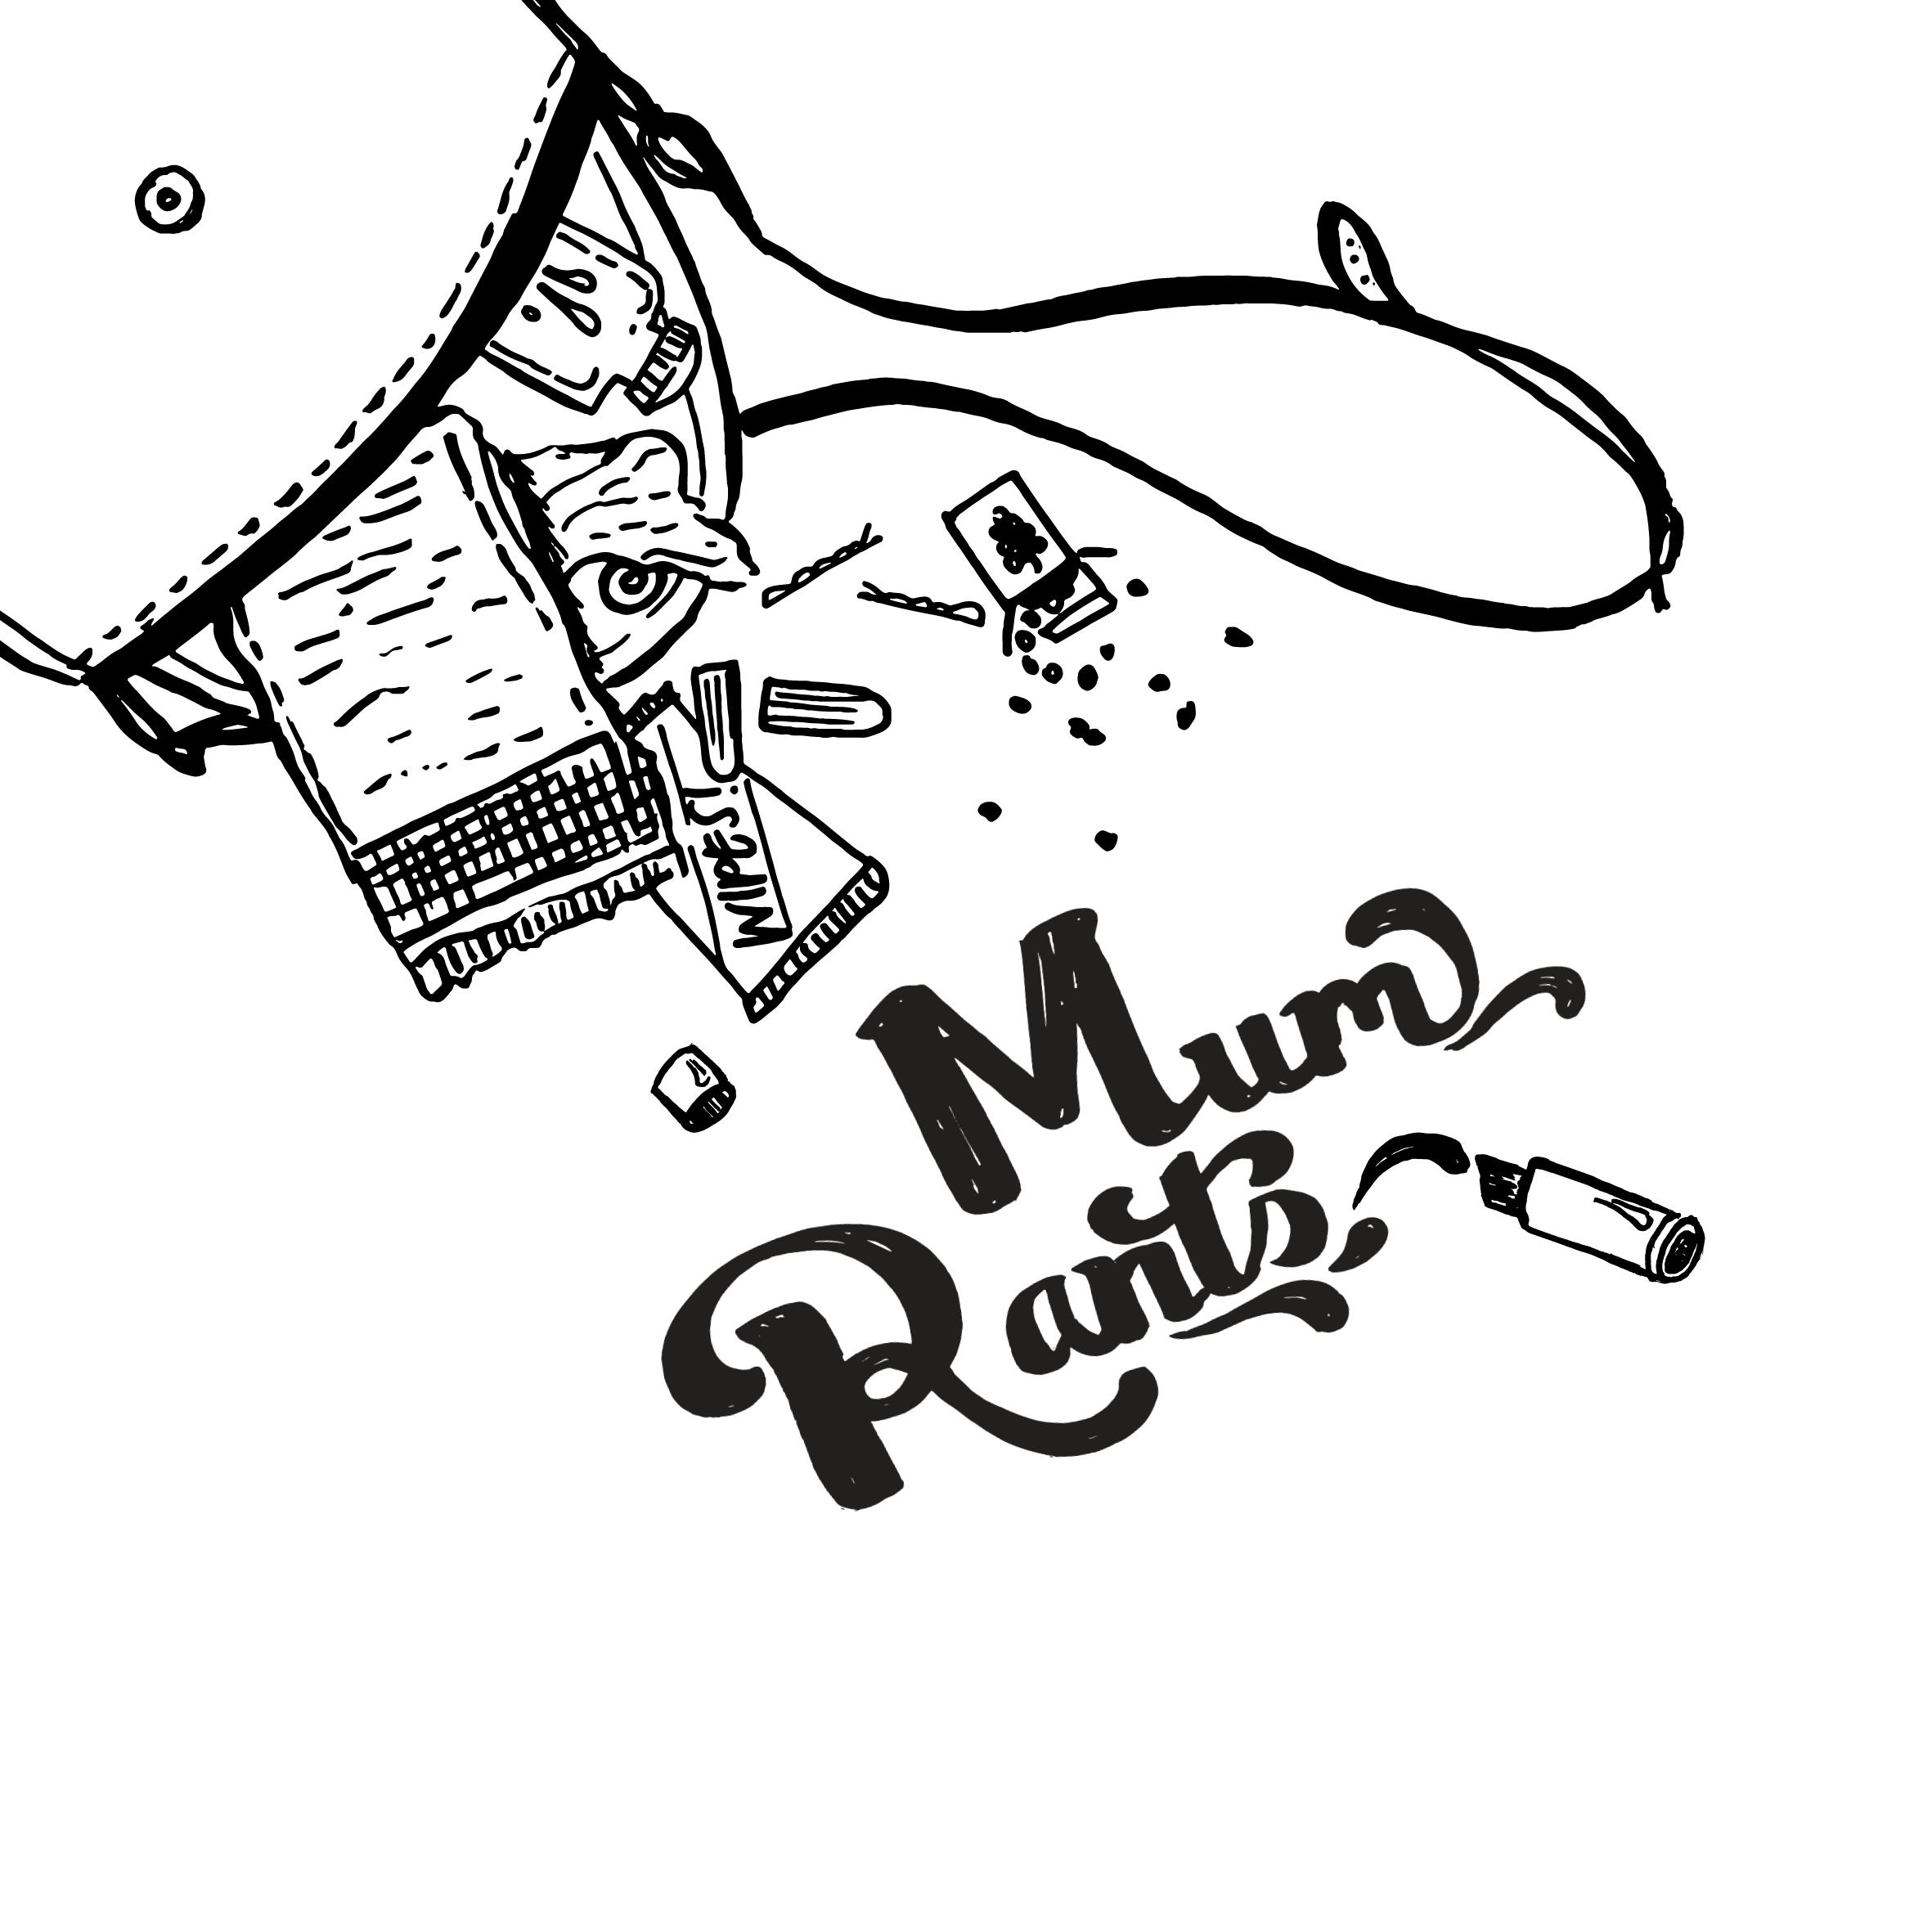 TheMumRants_Illustrations_v33.jpg